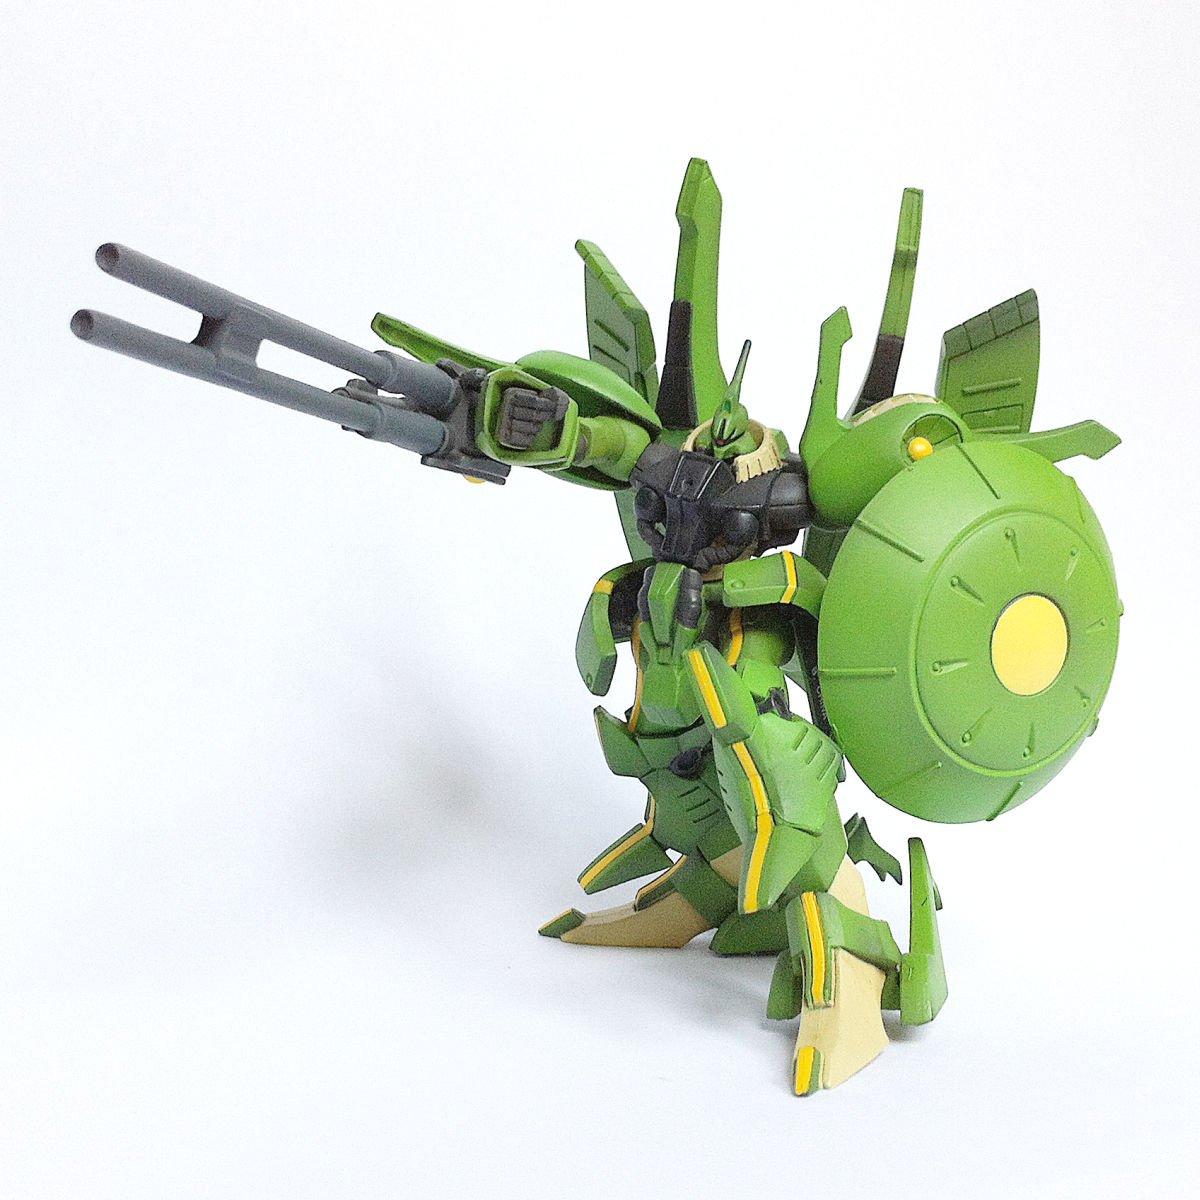 PMX-001 Palace Athene from HG Gundam MS Selection by Bandai